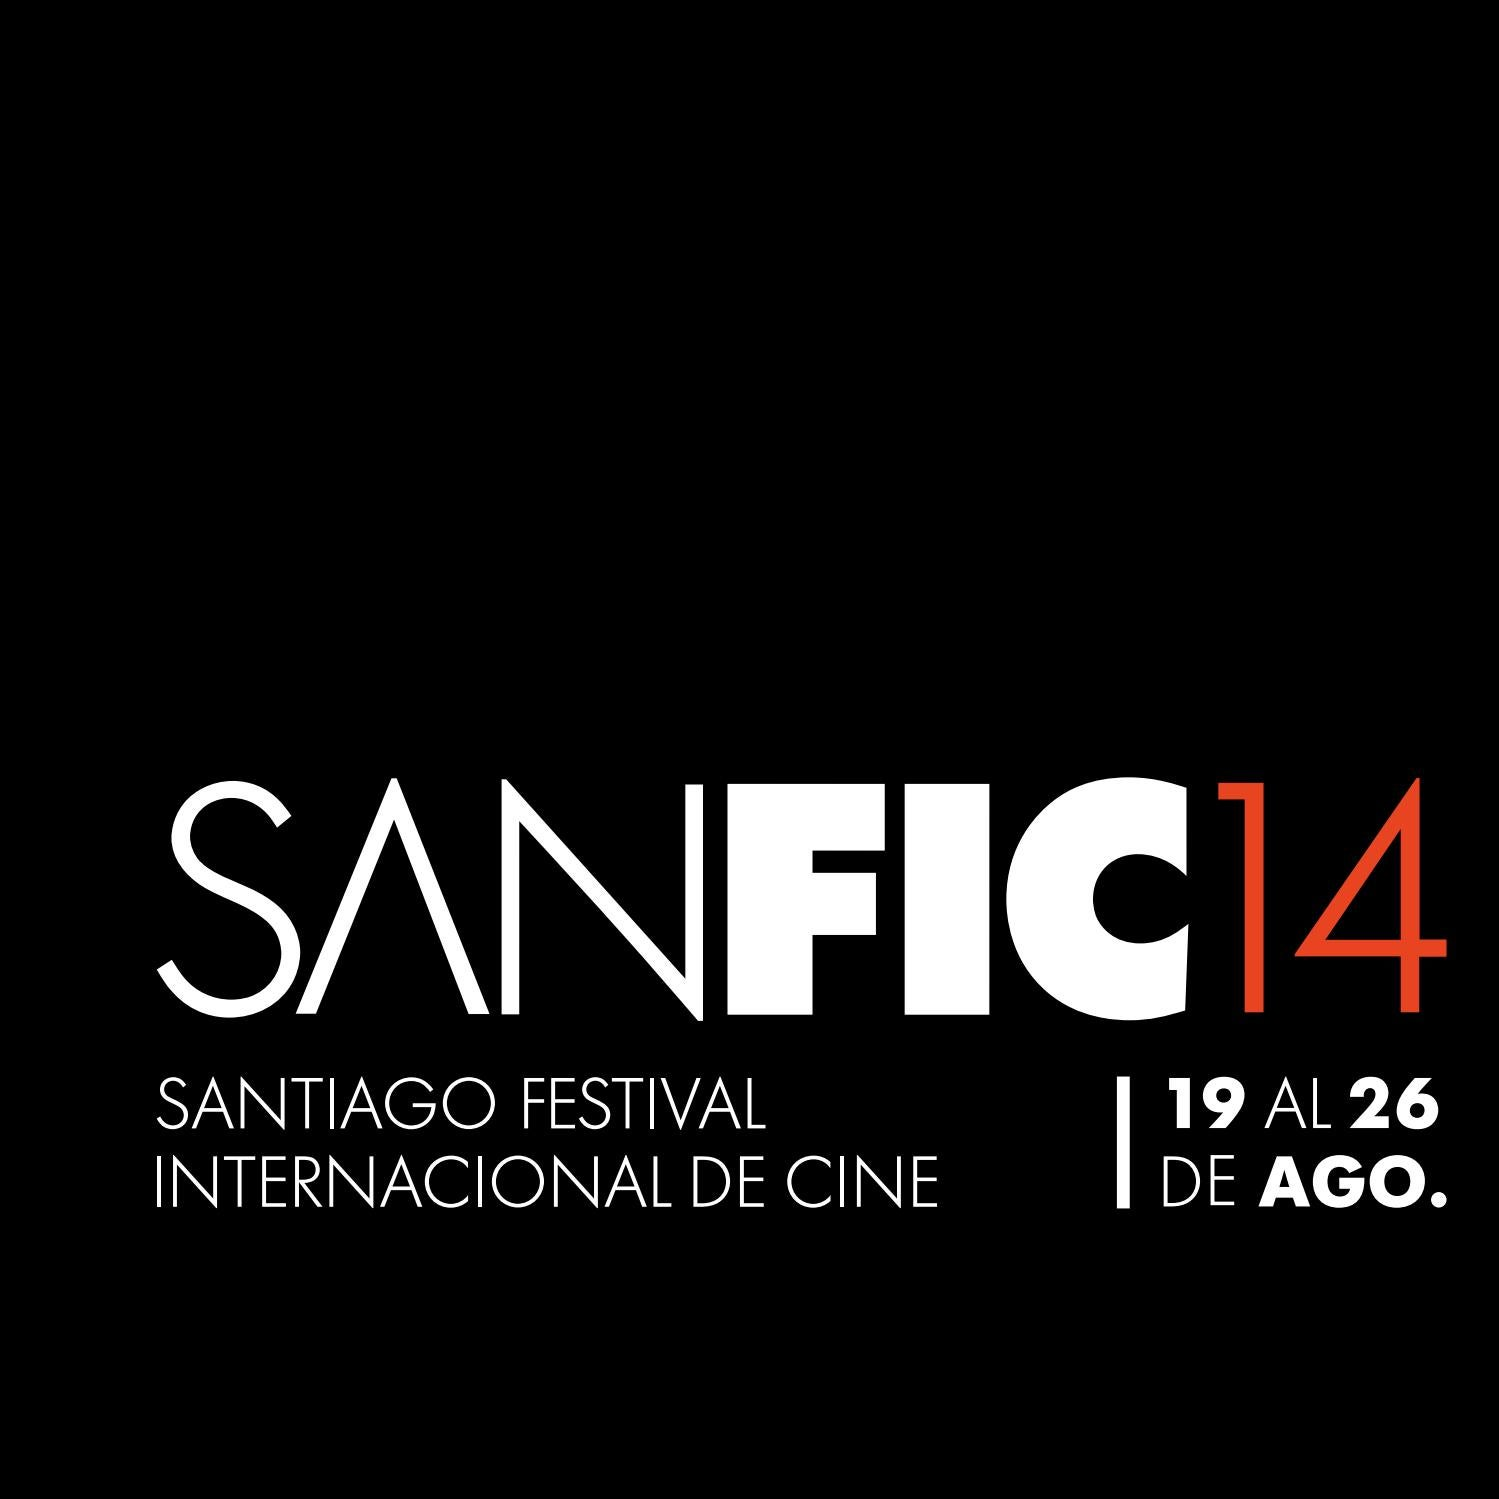 df2574f3 Catálogo SANFIC14 by Victor Hendrych - issuu